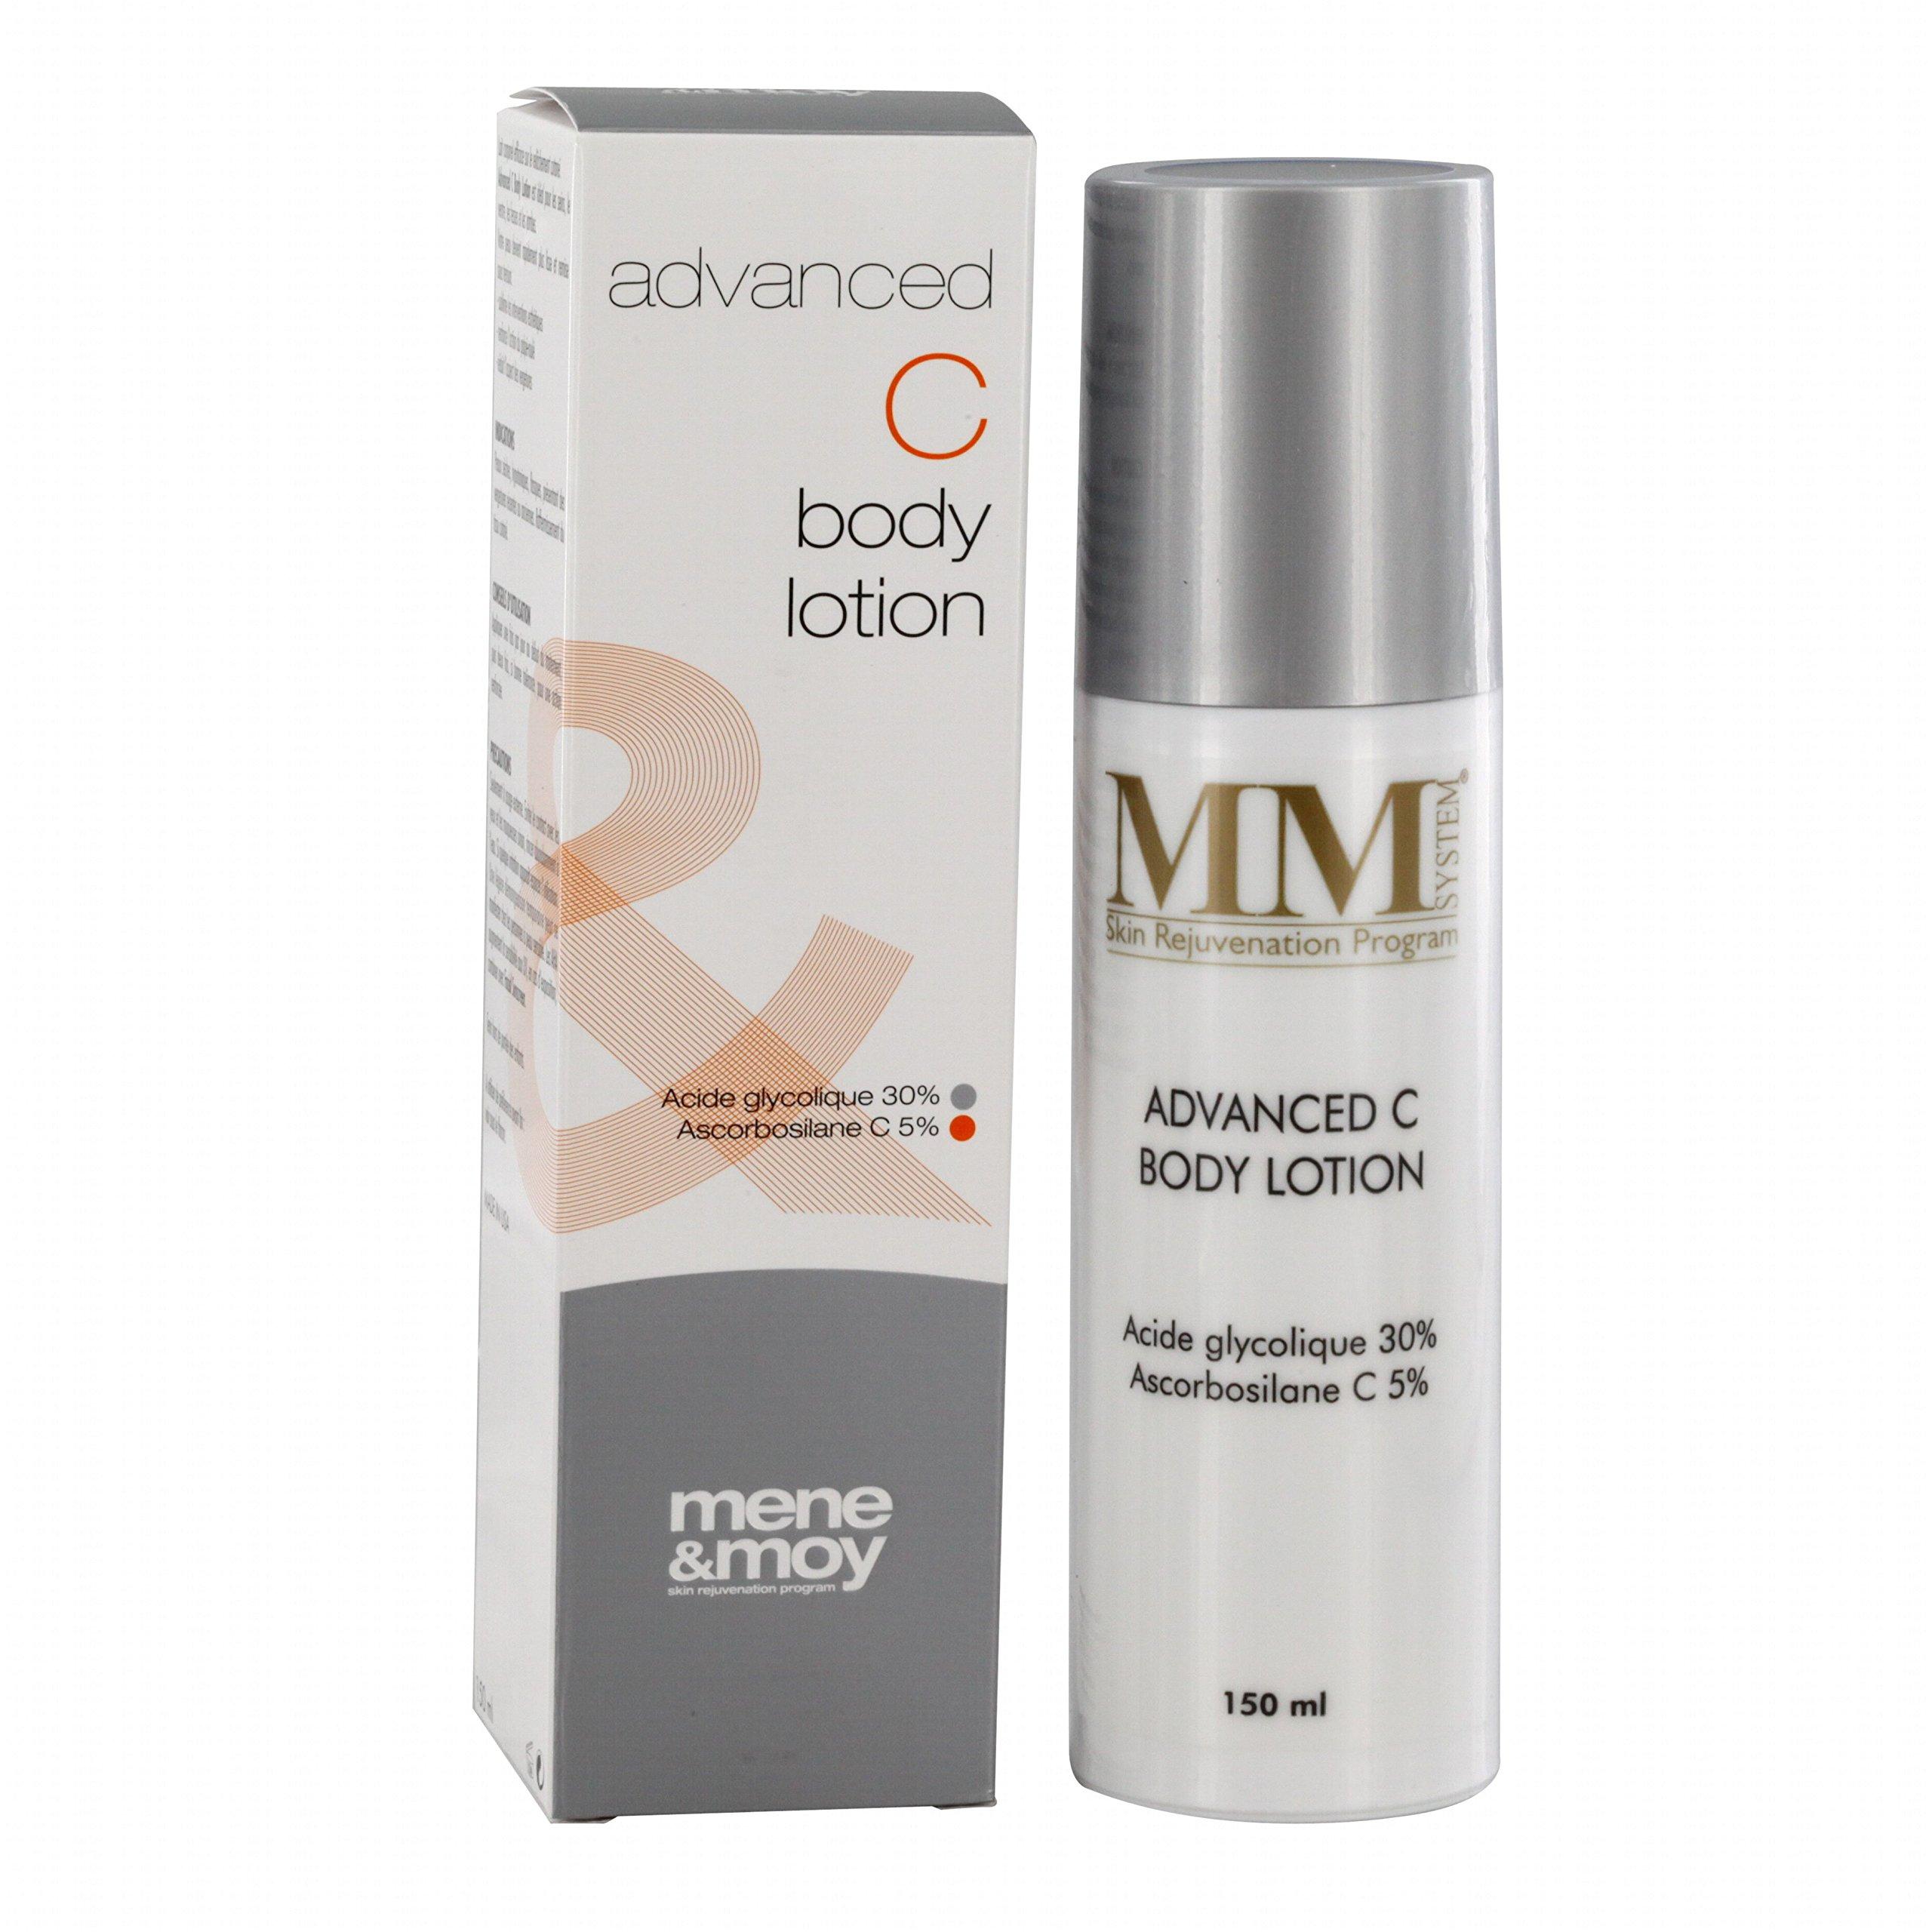 Mene & Moy Advanced C Body Lotion - 150ml